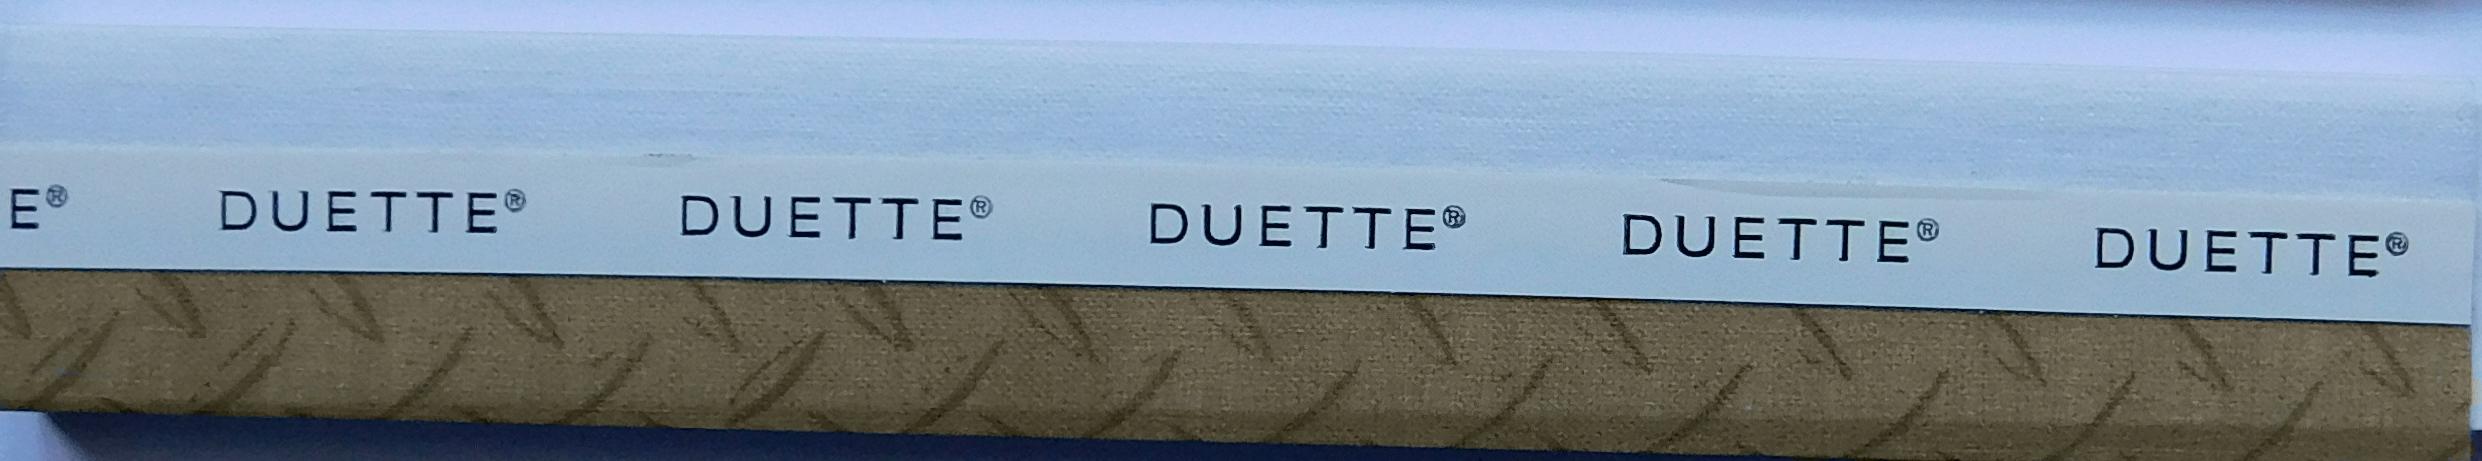 Hank Elephant Duette Blind Fabric